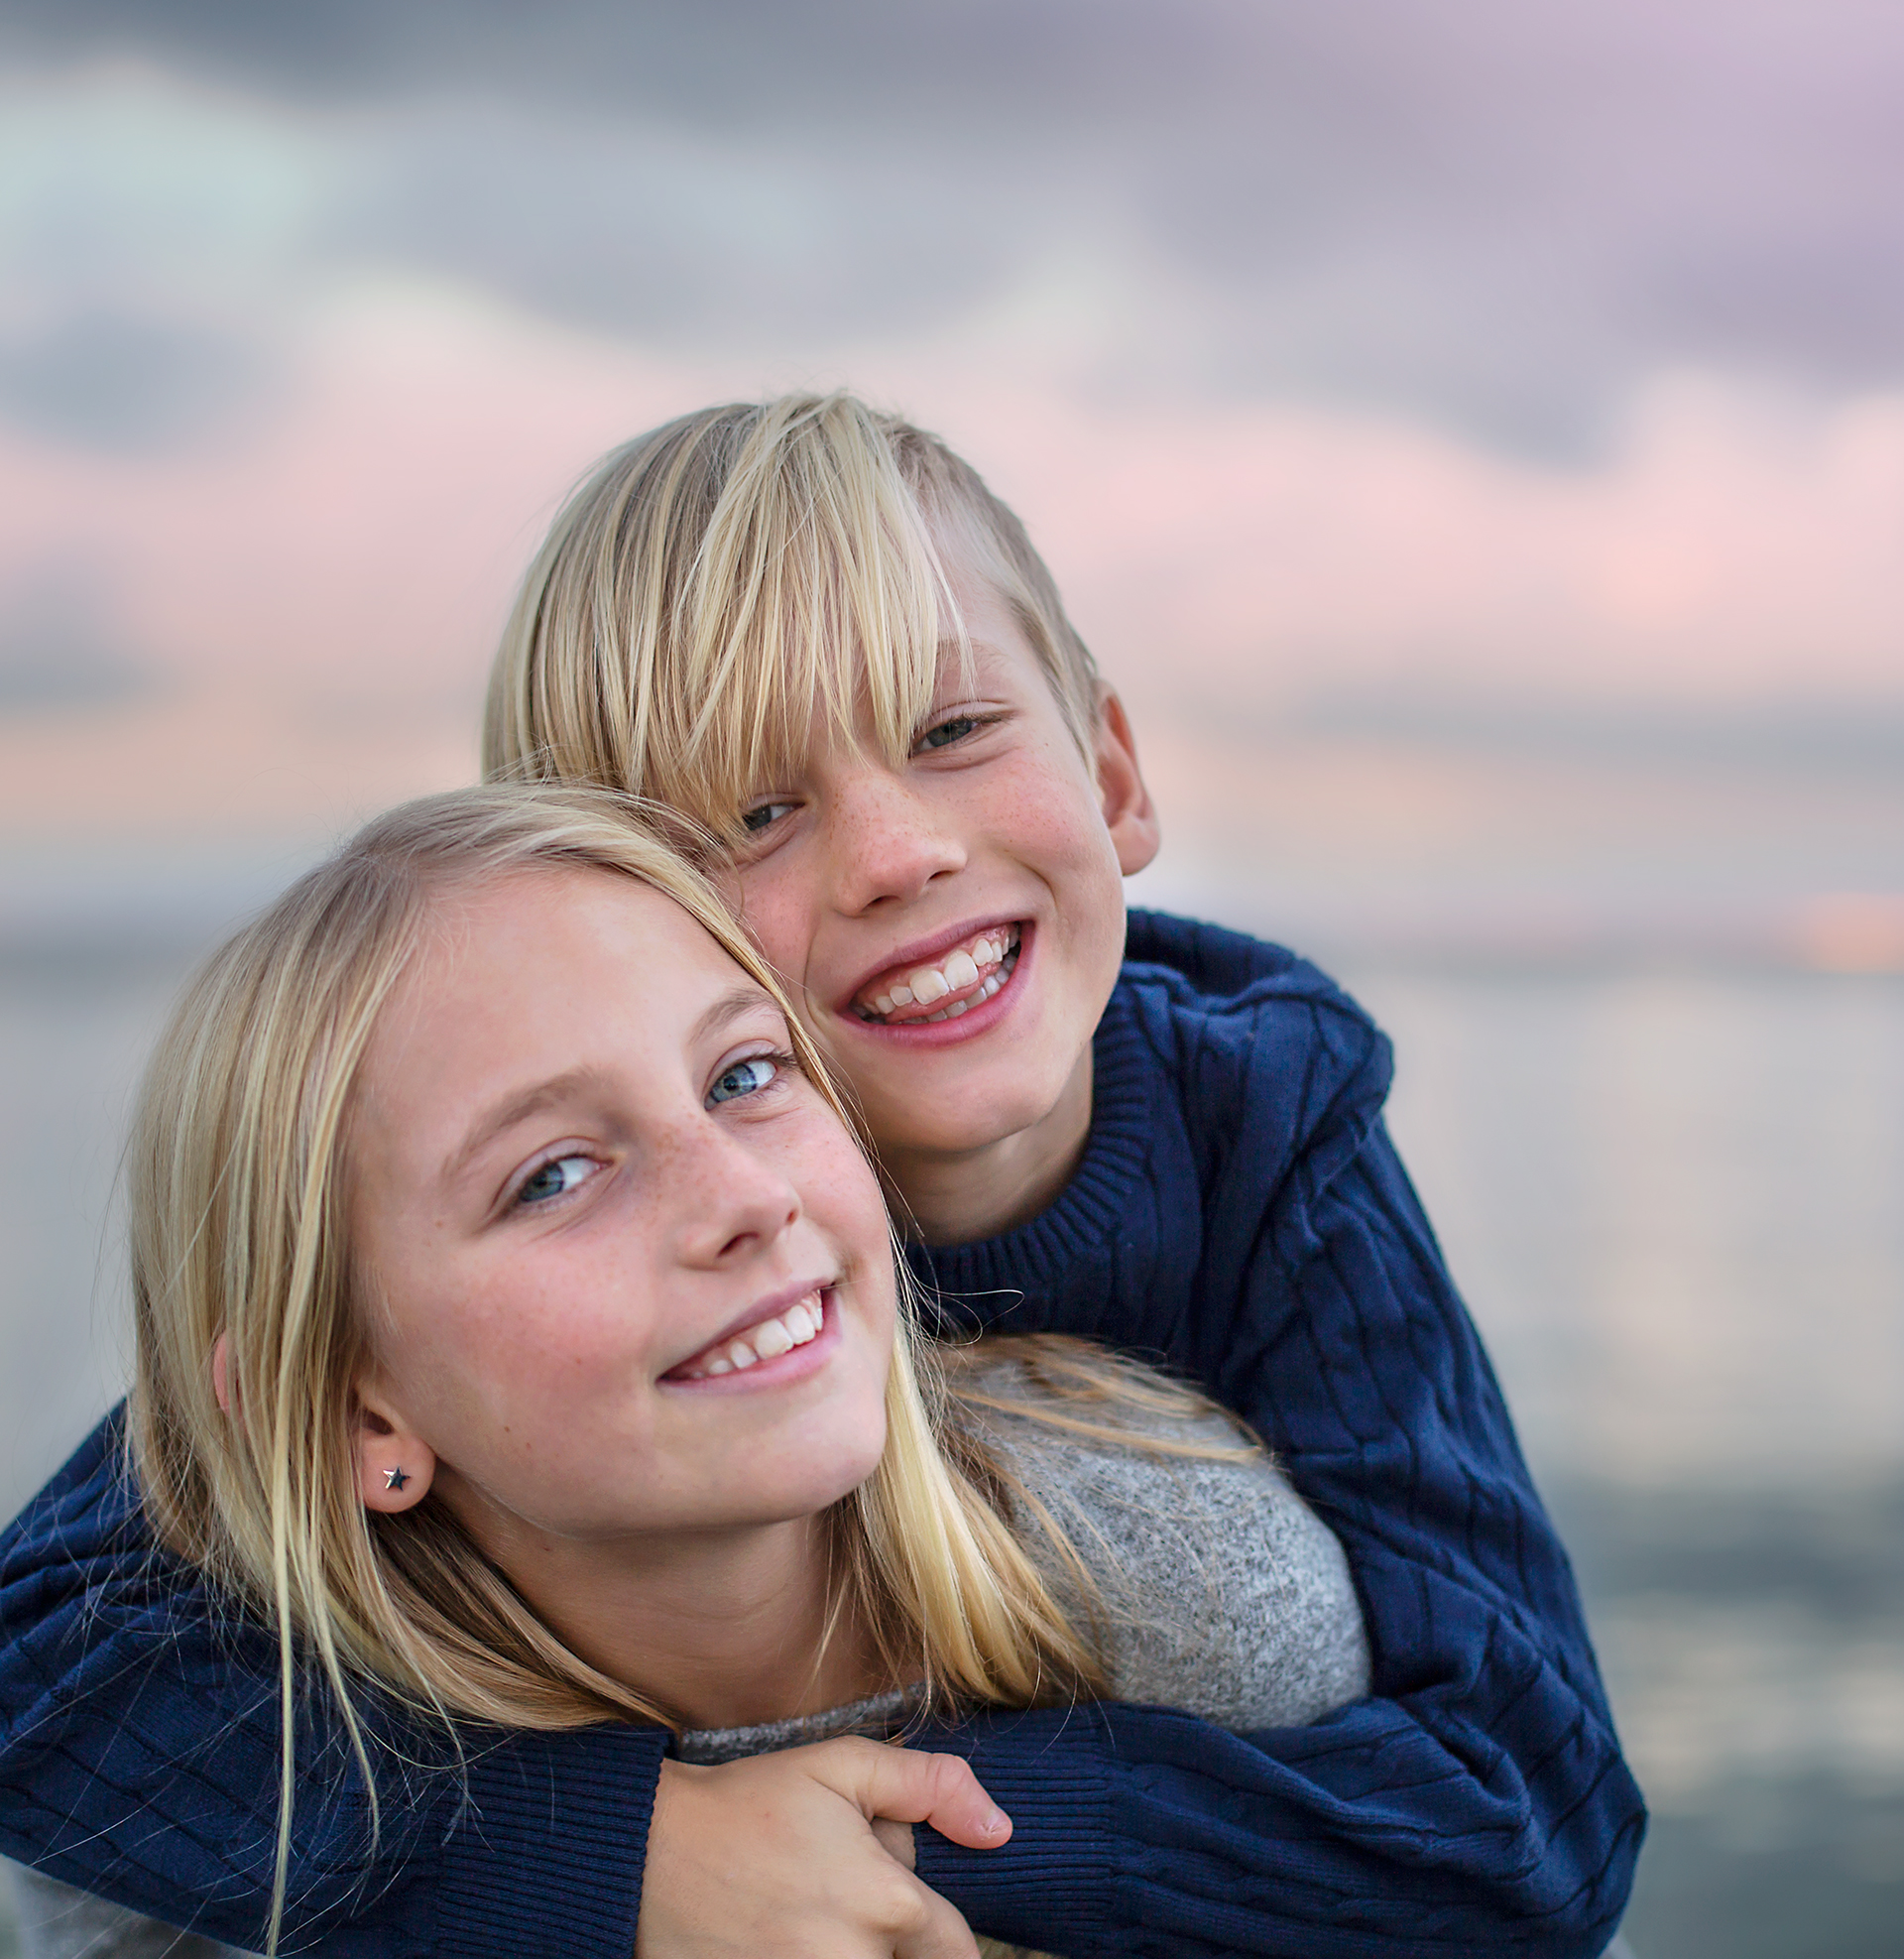 gyllene timmen, golden hour, barnfotograf, syskonbild, barnporträtt, I Tell Your Story, barnfotograf, Helsingborg, Skåne, syskon, porträttfotograf, porträttbilder, Christine